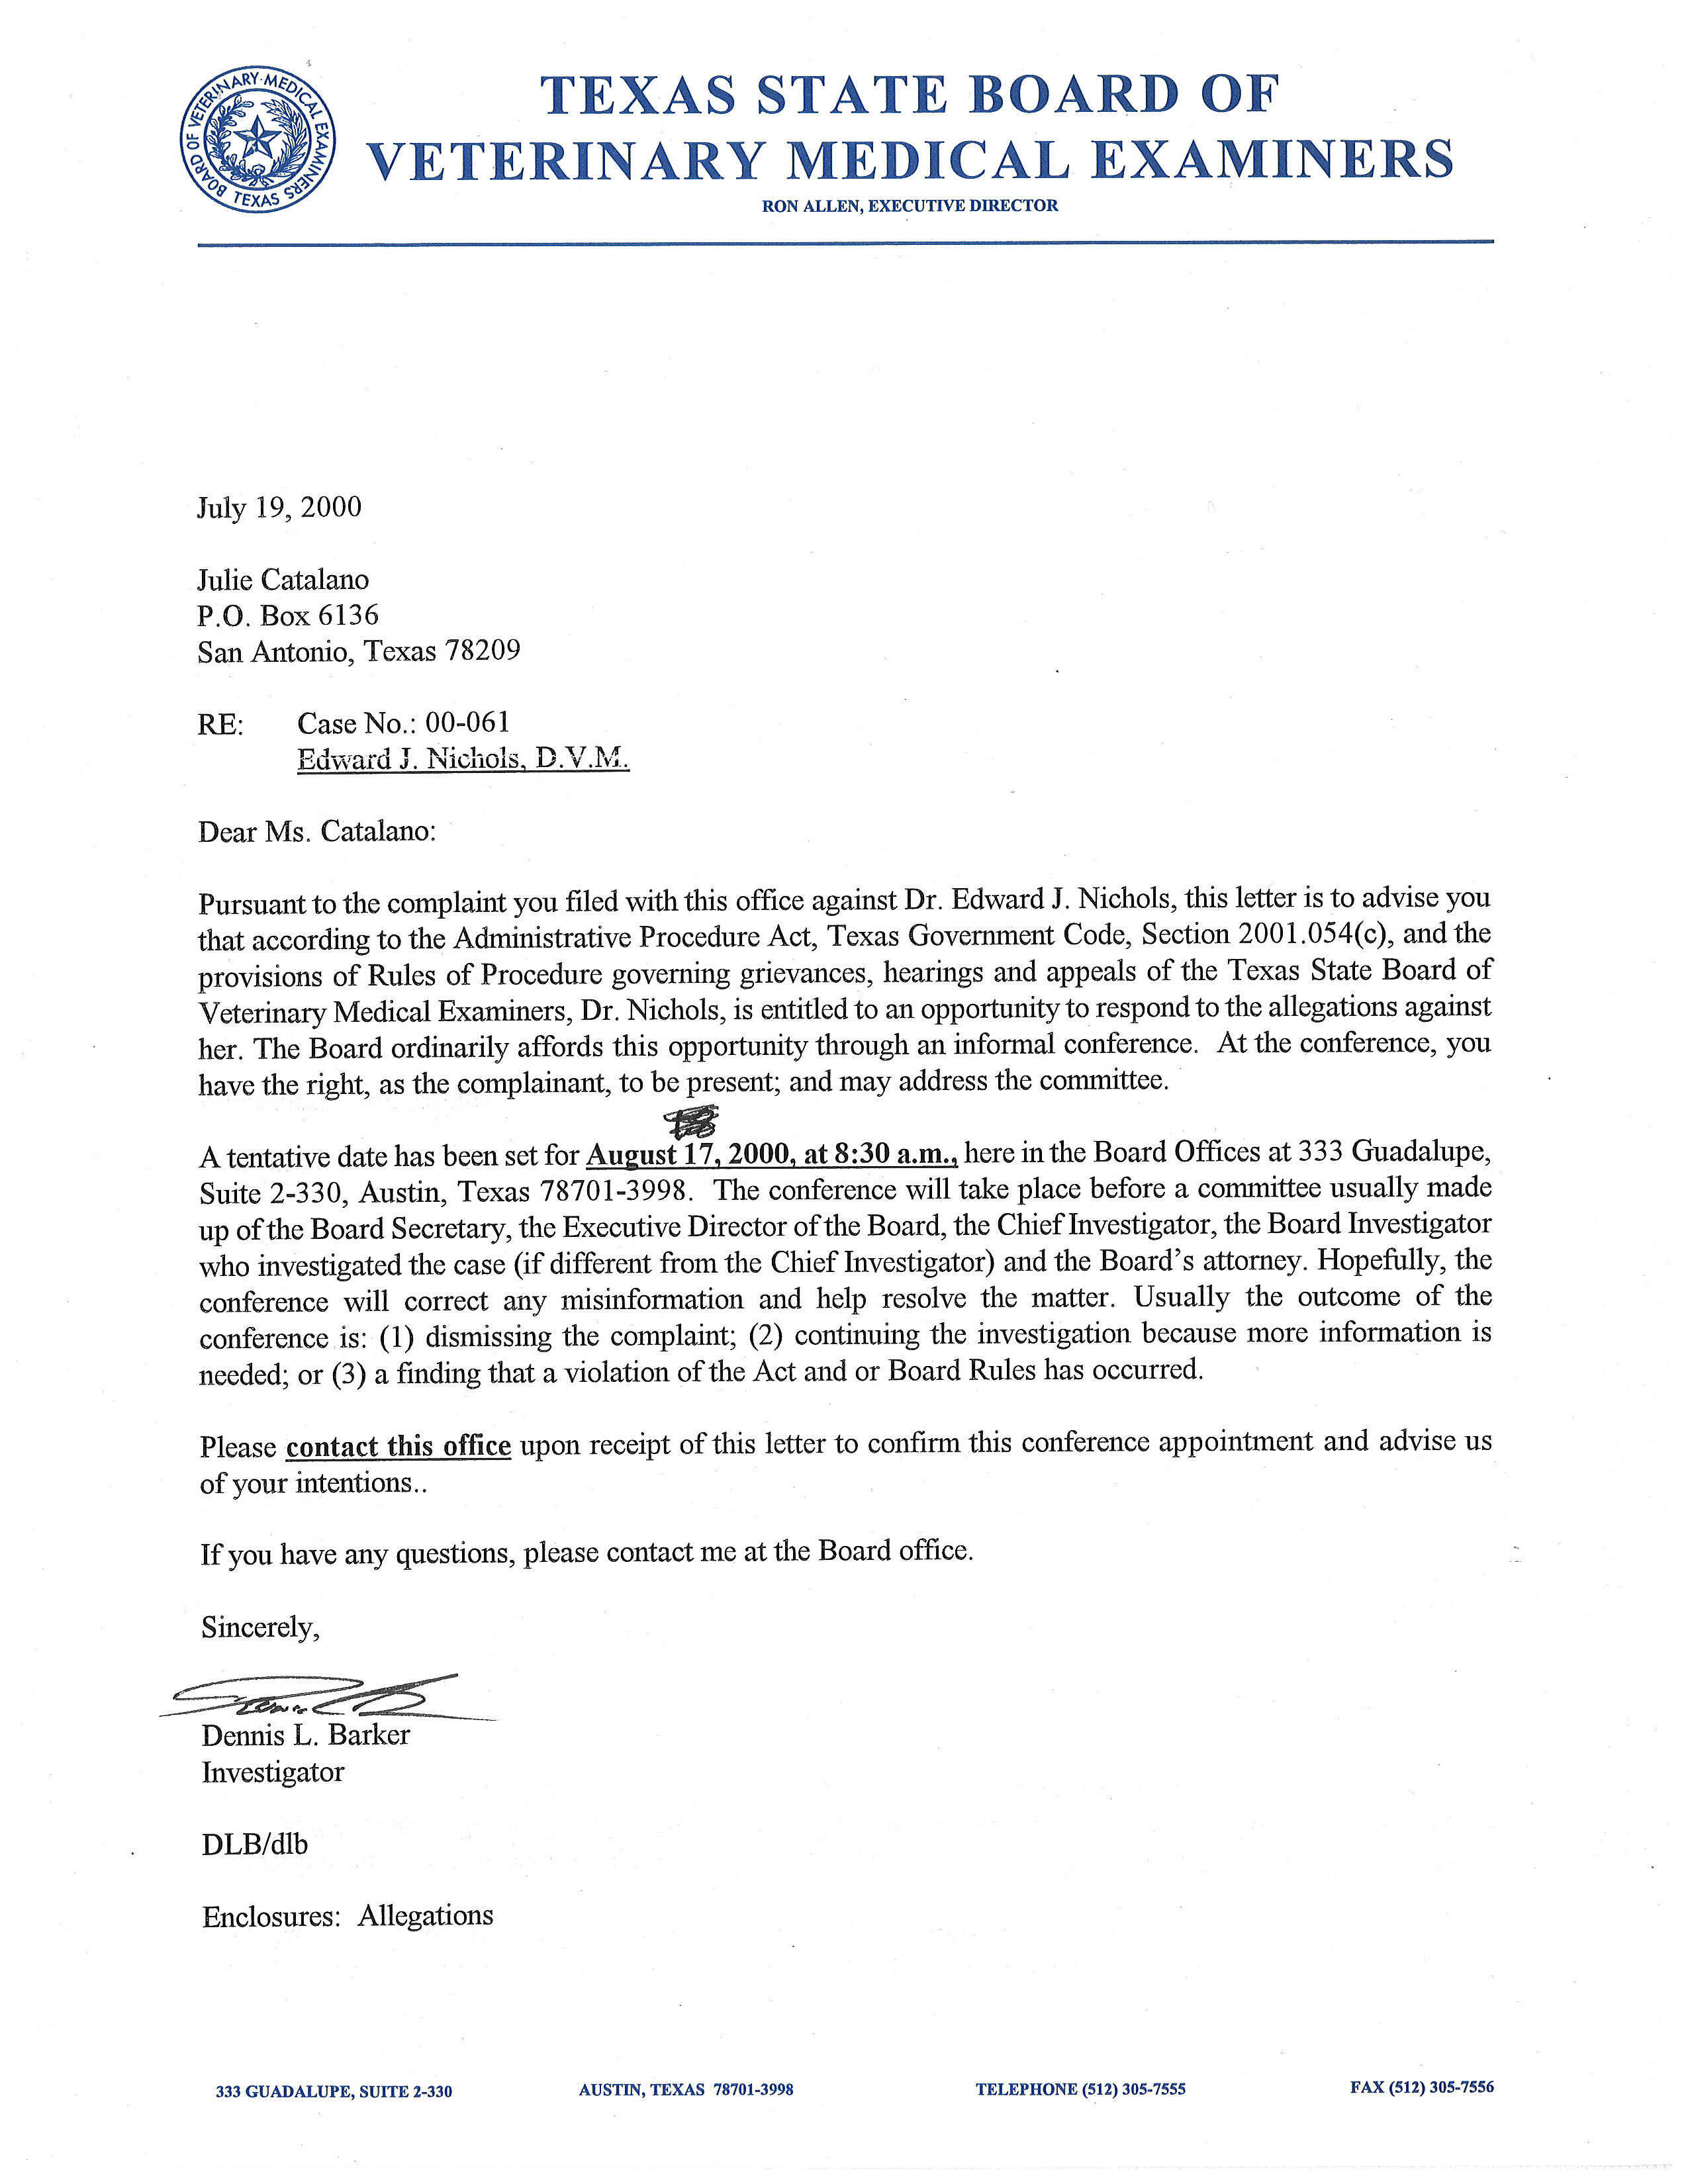 Informal letter example resumes informal letter extra large laminated poster amazon office altavistaventures Images